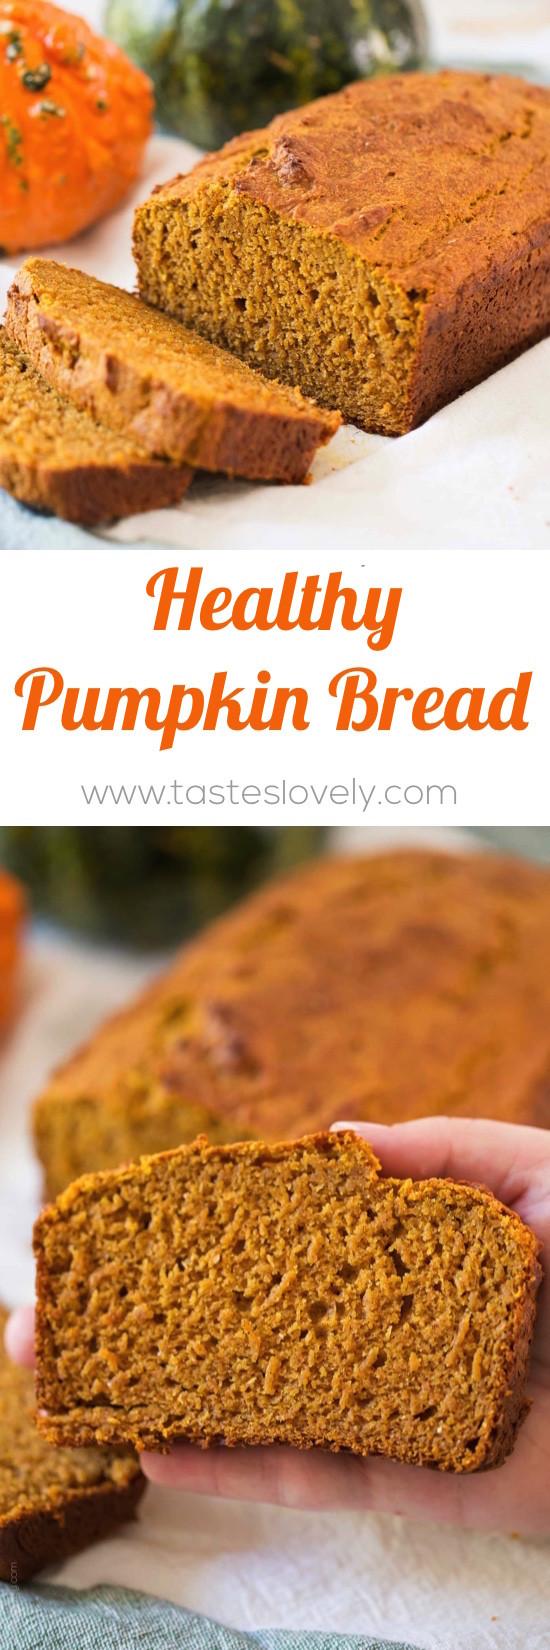 Pumpkin Bread Healthy  Healthy Pumpkin Bread — Tastes Lovely